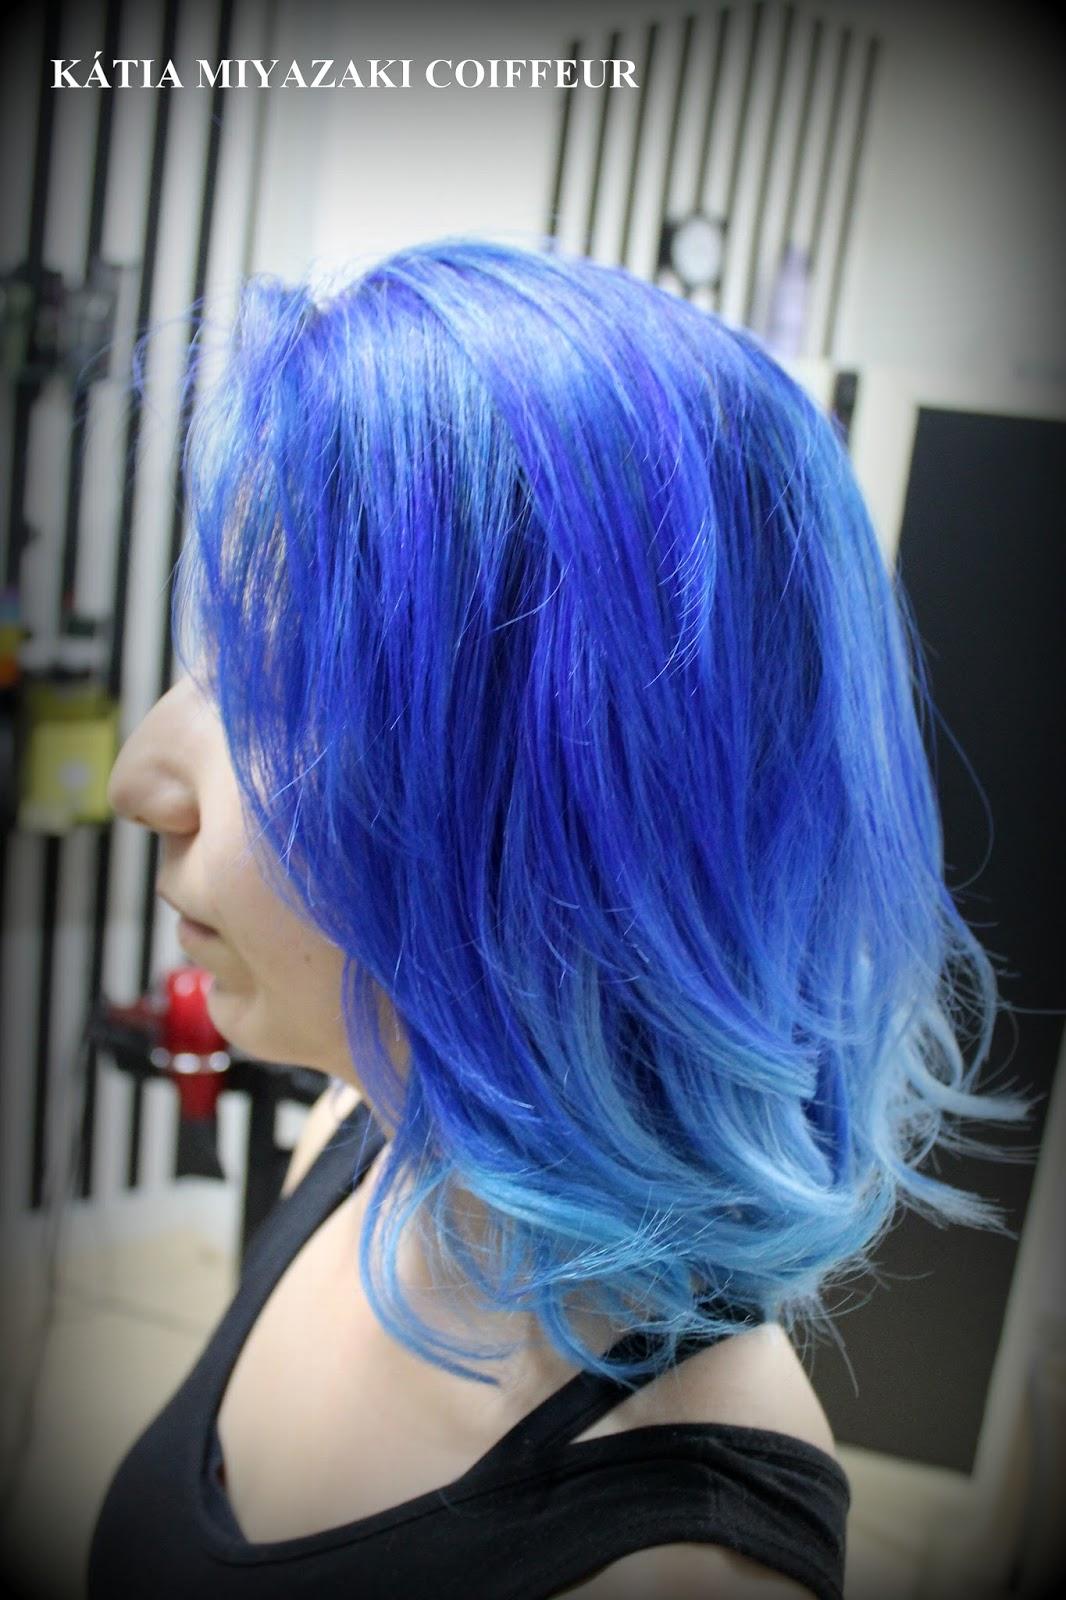 Katia Miyazaki Coiffeur Cabelos coloridos  cabelo azul